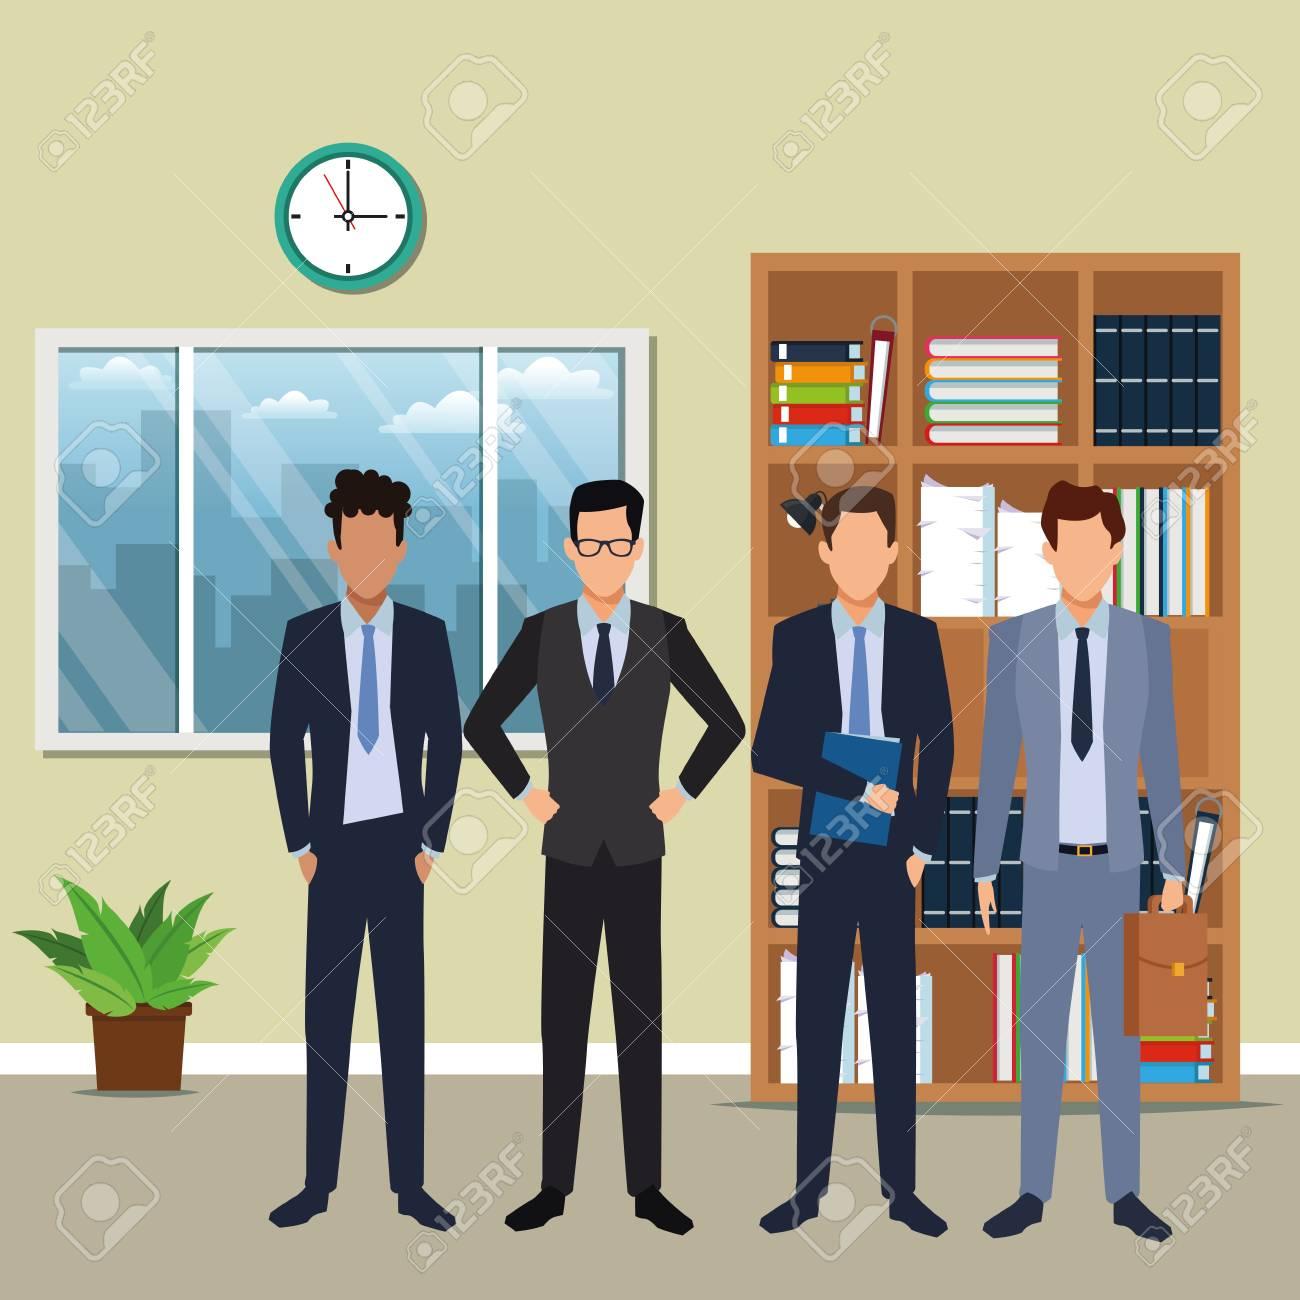 executive business men cartoon inside office building scenery vector illustration graphic design - 120441607